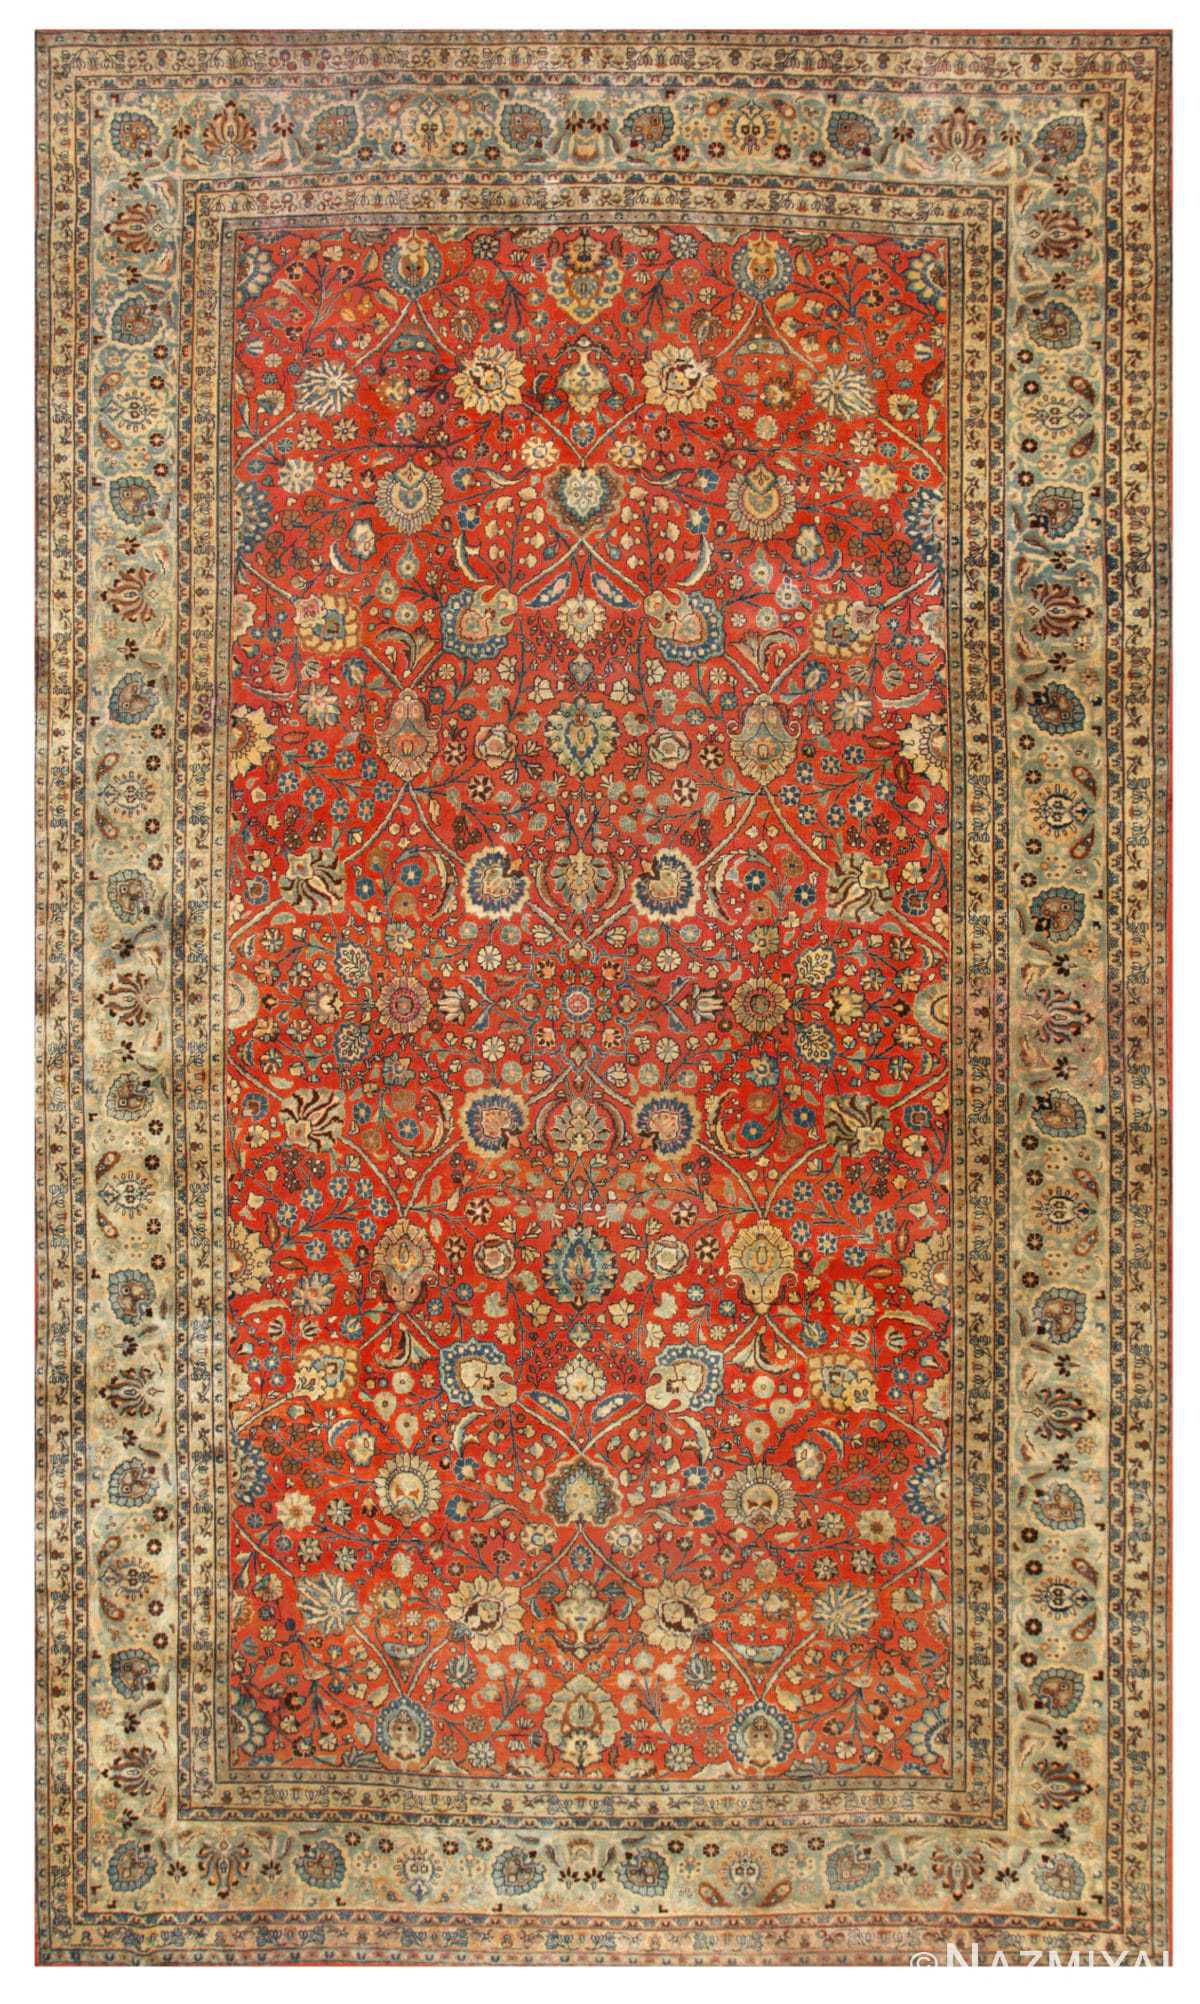 Antique Tabriz Persian Carpets 44813 Nazmiyal